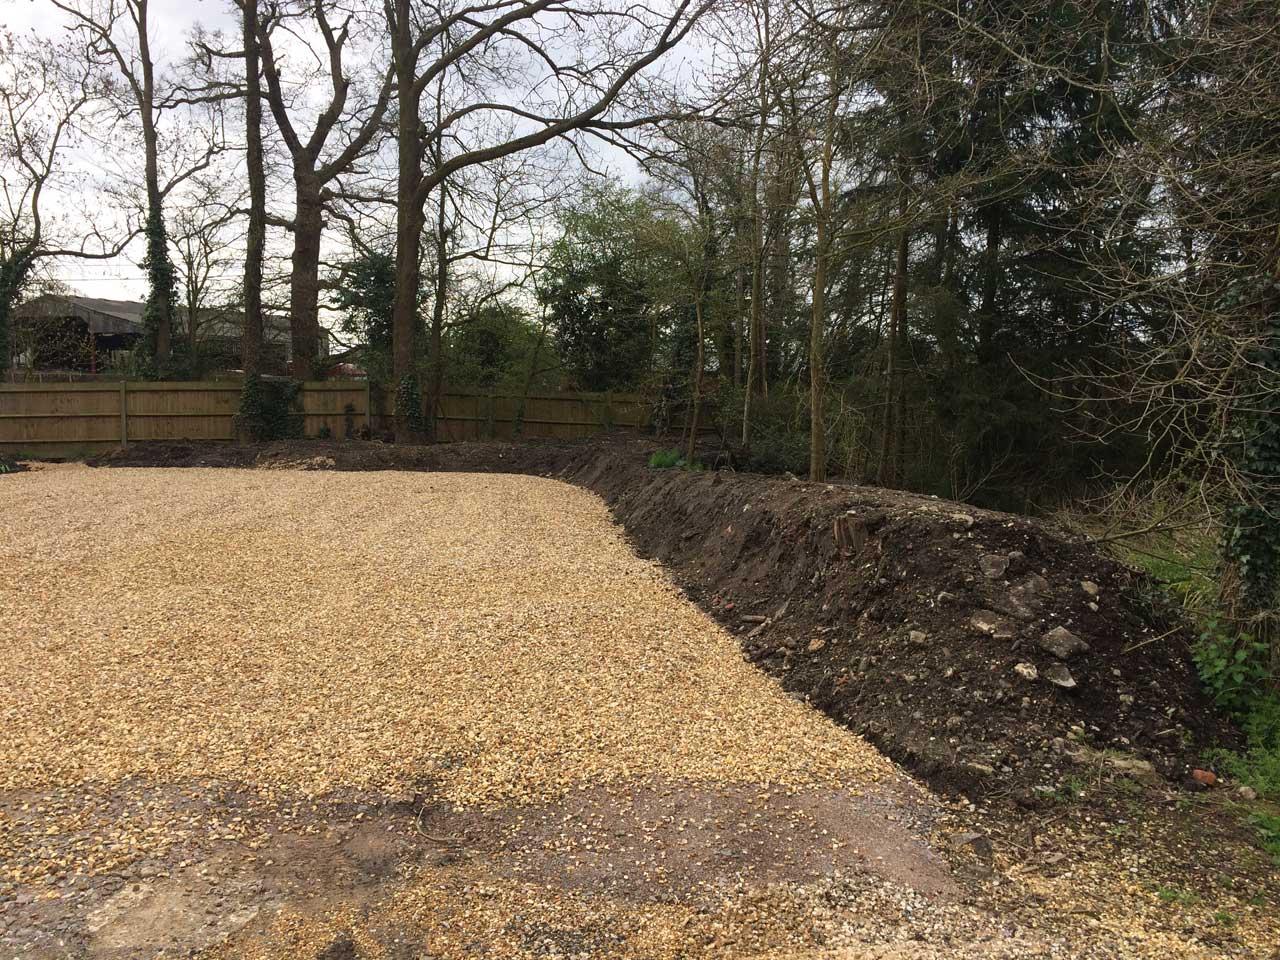 Image of Earthworks - Earth Berm - Berkshire Hampshire Surrey - Car park driveway construction Holme Grange School Wokingham Berkshire - Let the Digger Do It